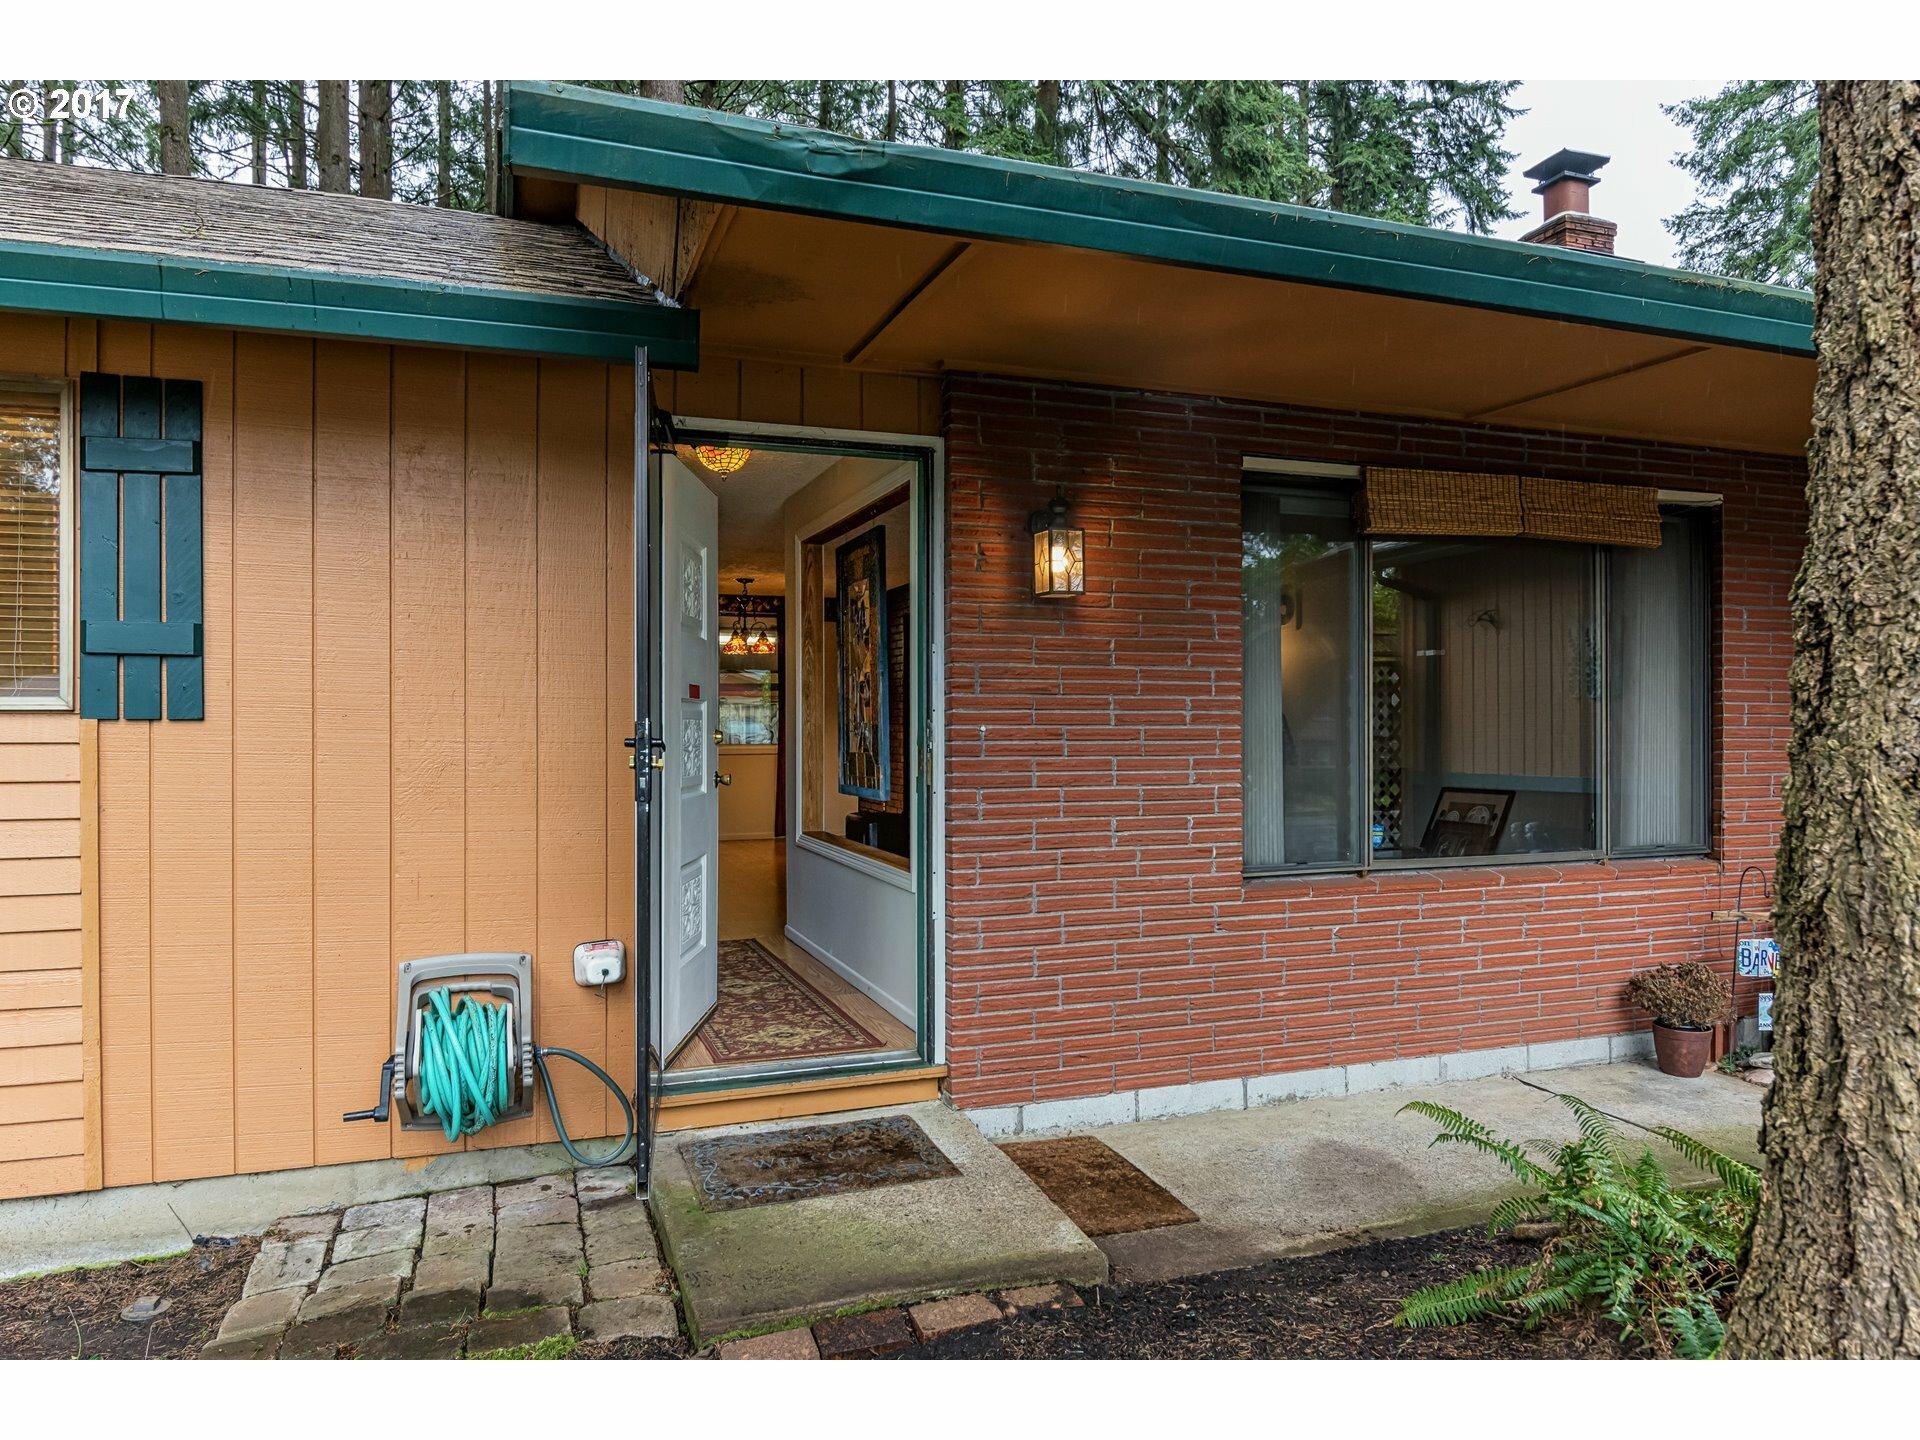 4217 Ne 152nd Ave, Vancouver, WA - USA (photo 4)